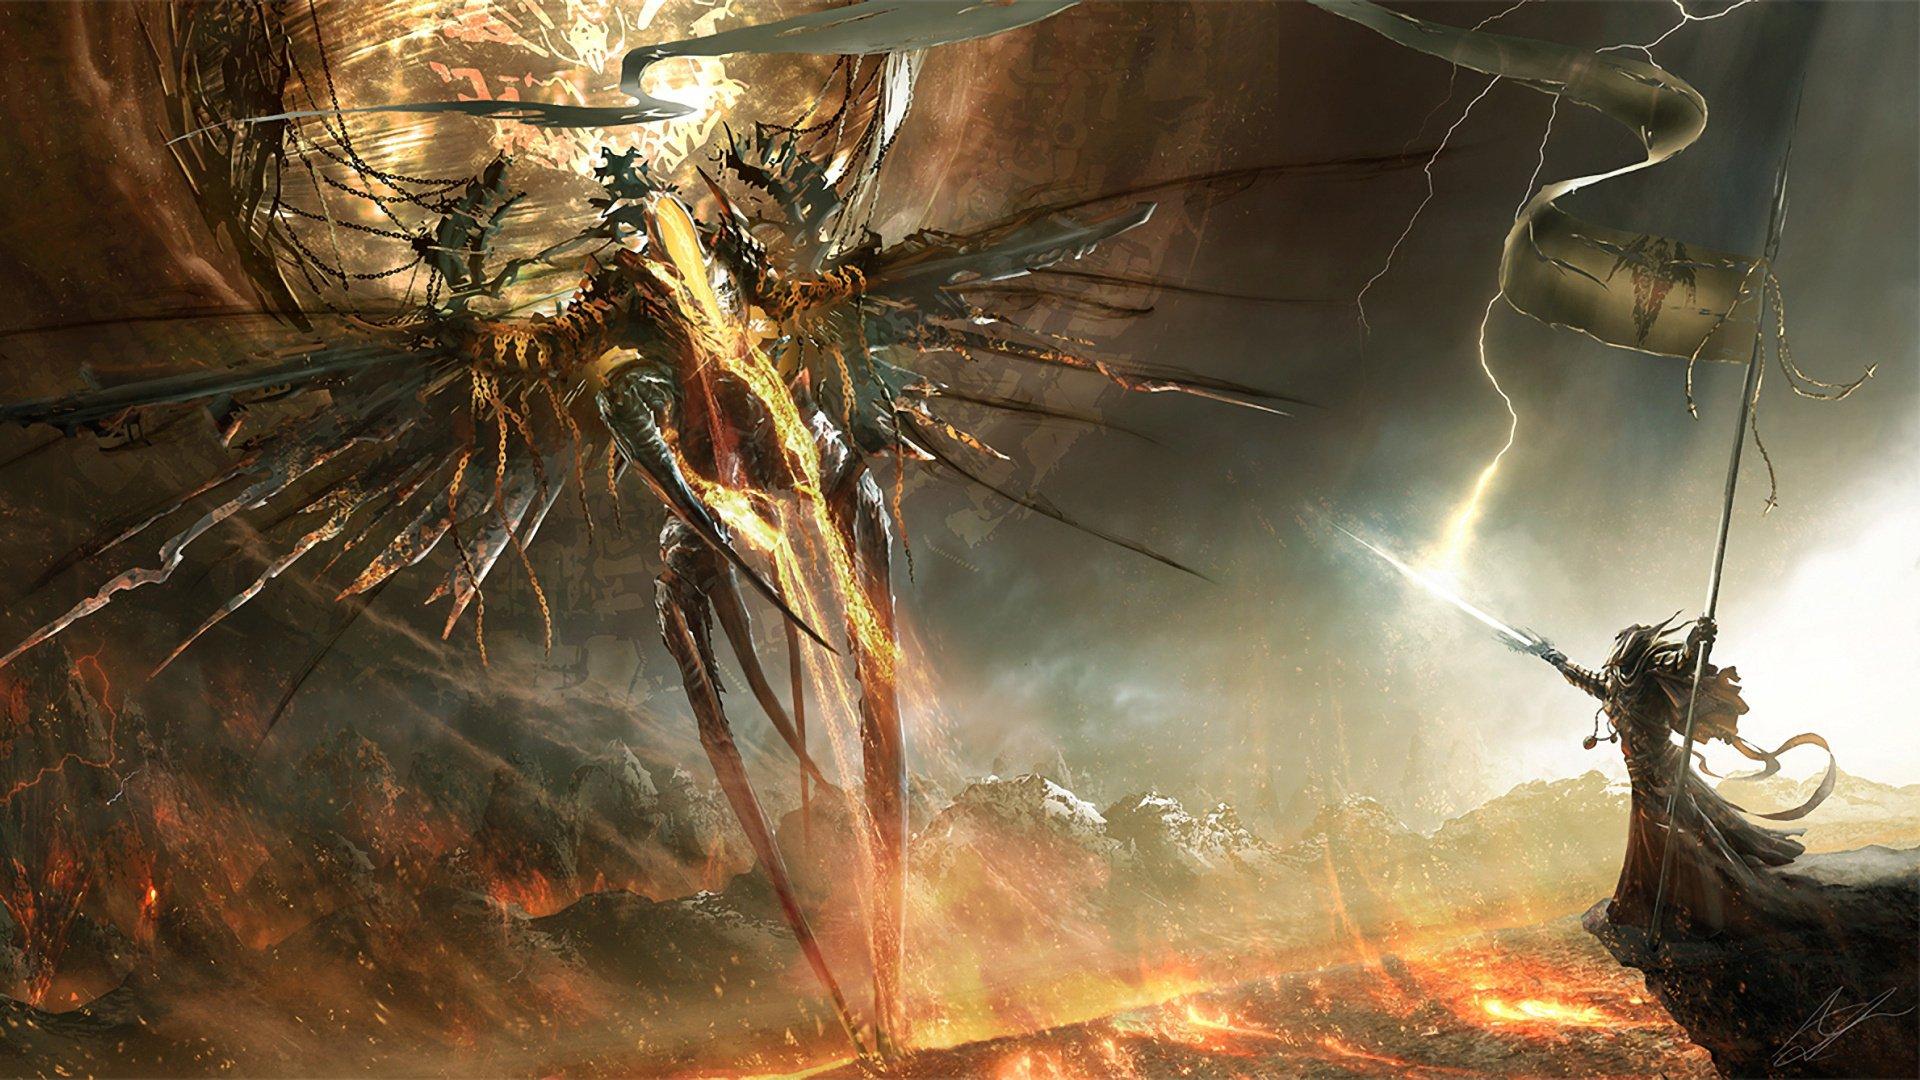 epic_creature_hd_battle_dark_fight_sorcerer_hd-wallpaper-1209366